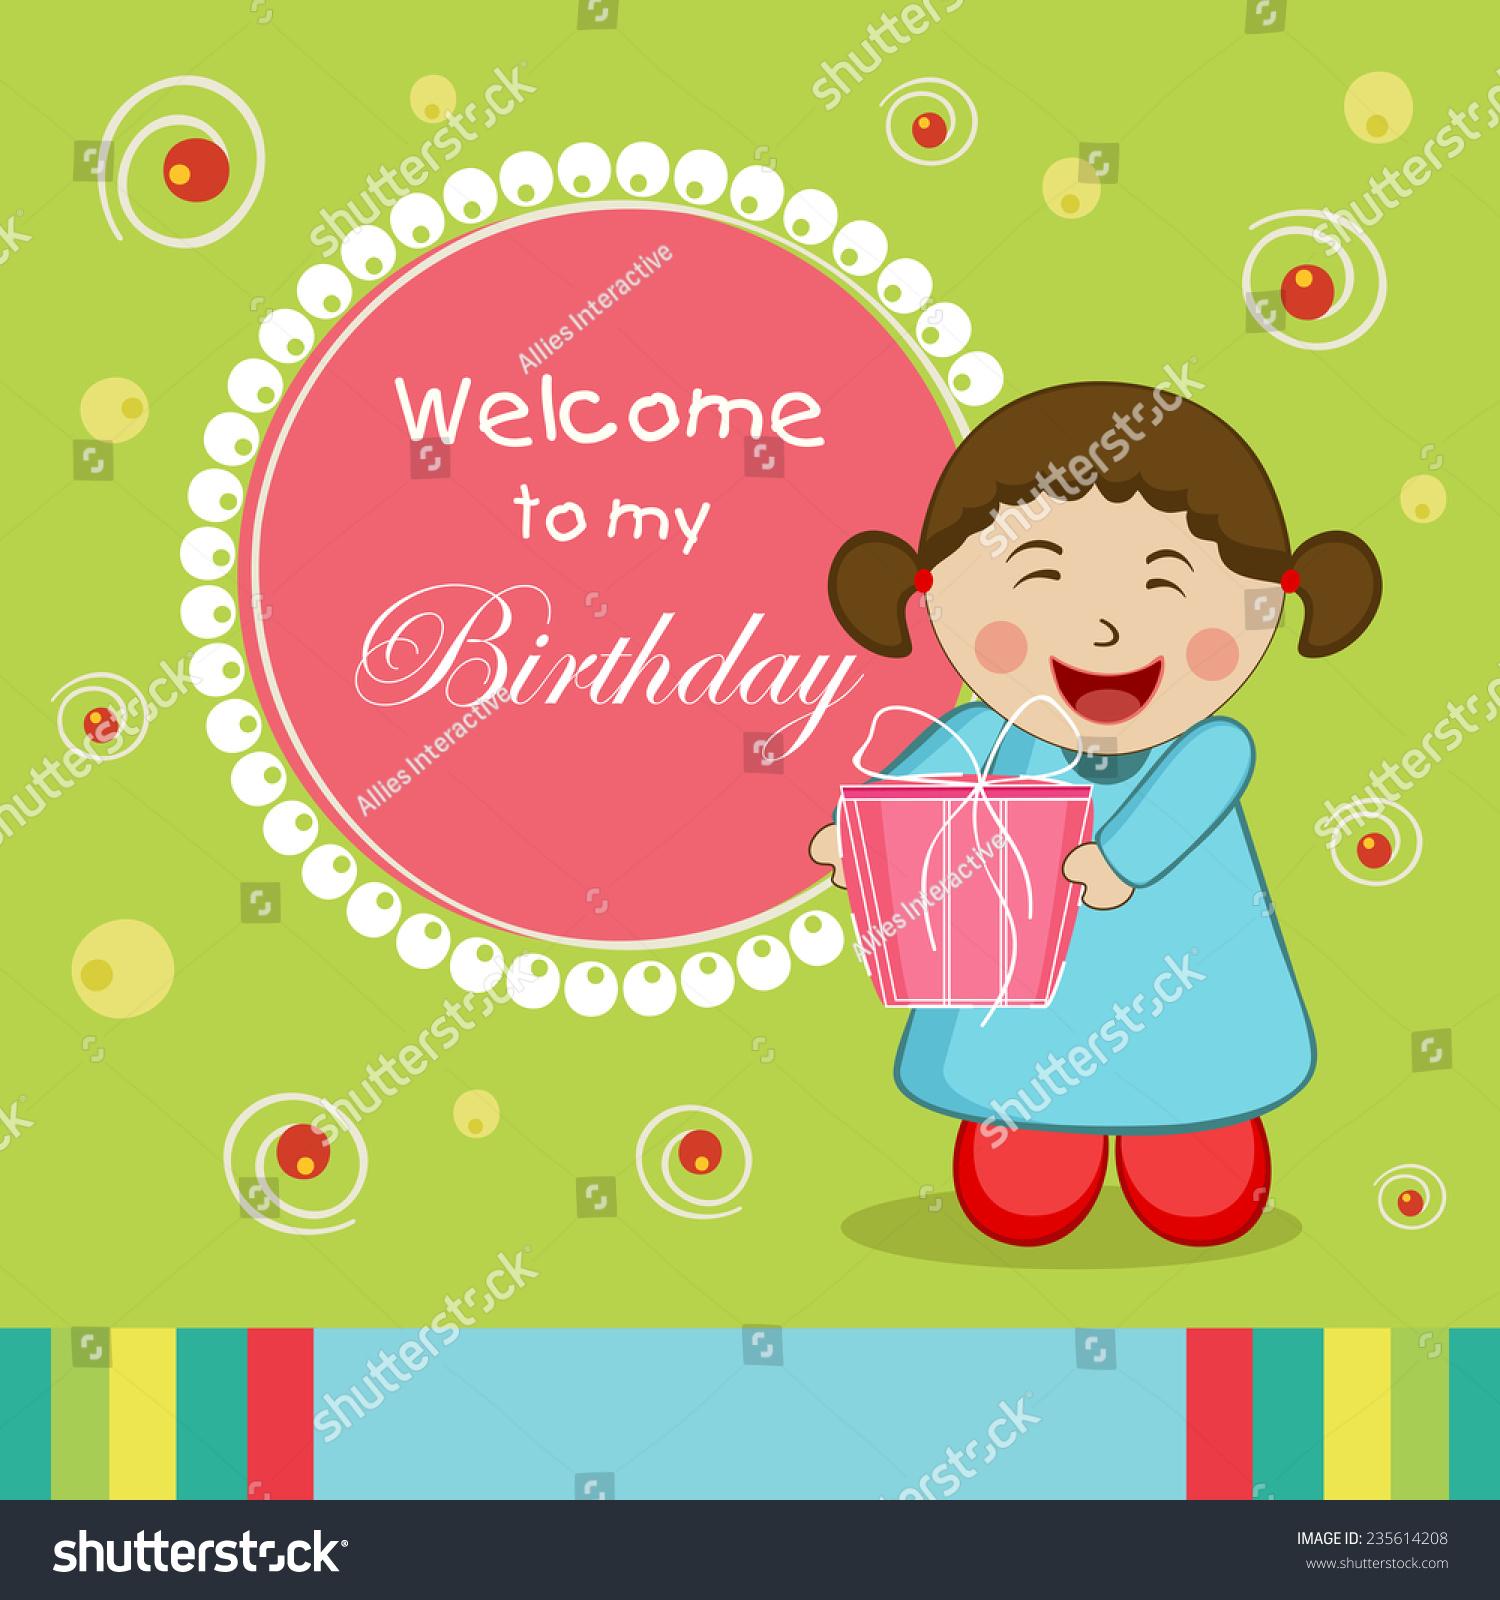 Kids Birthday Celebration Invitation Card Design Stock Vector HD ...